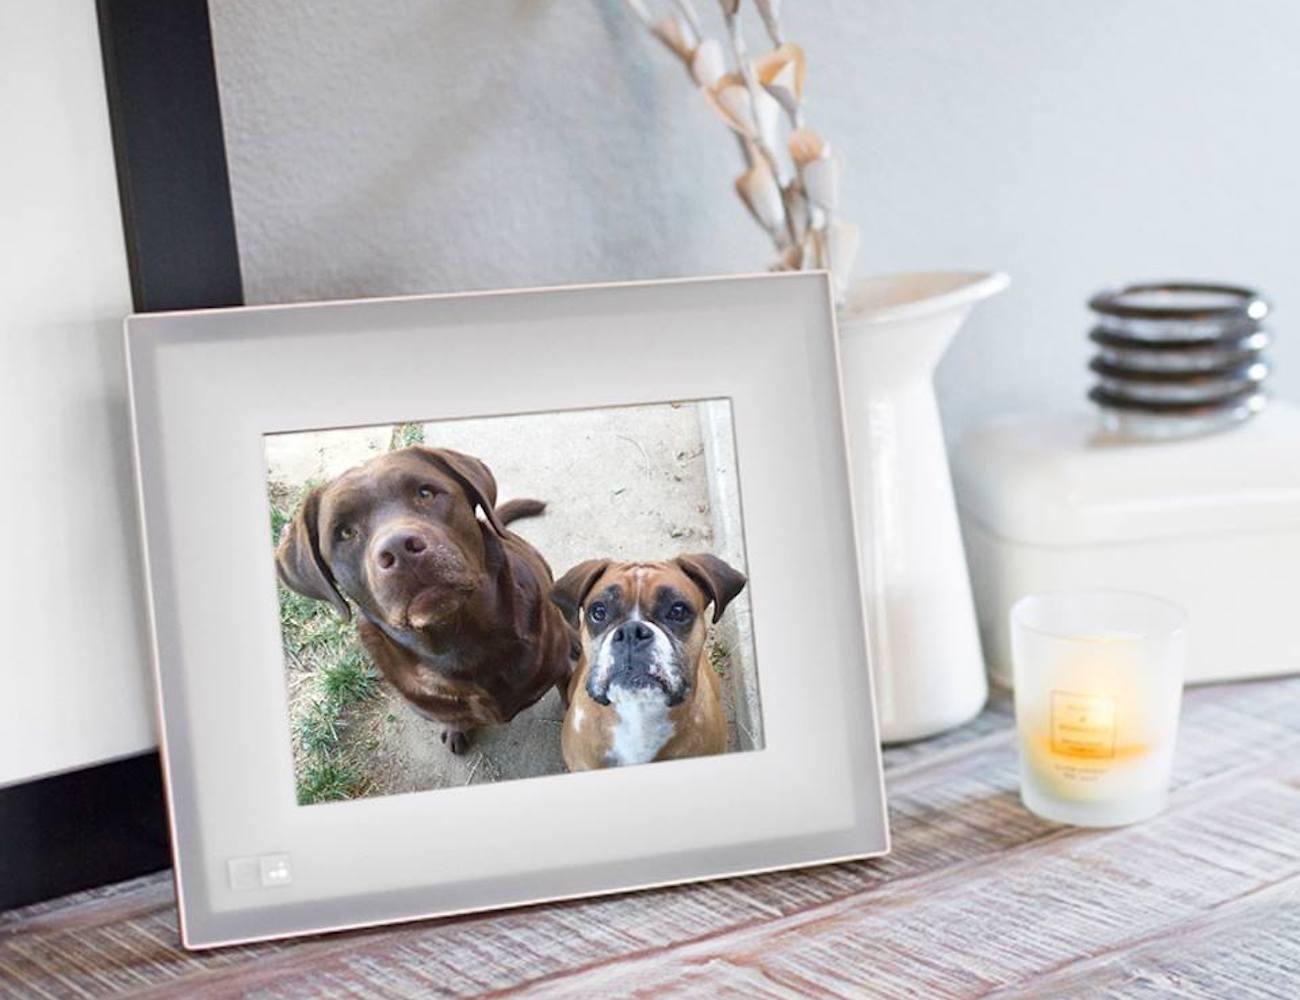 Aura Digital Picture Frame